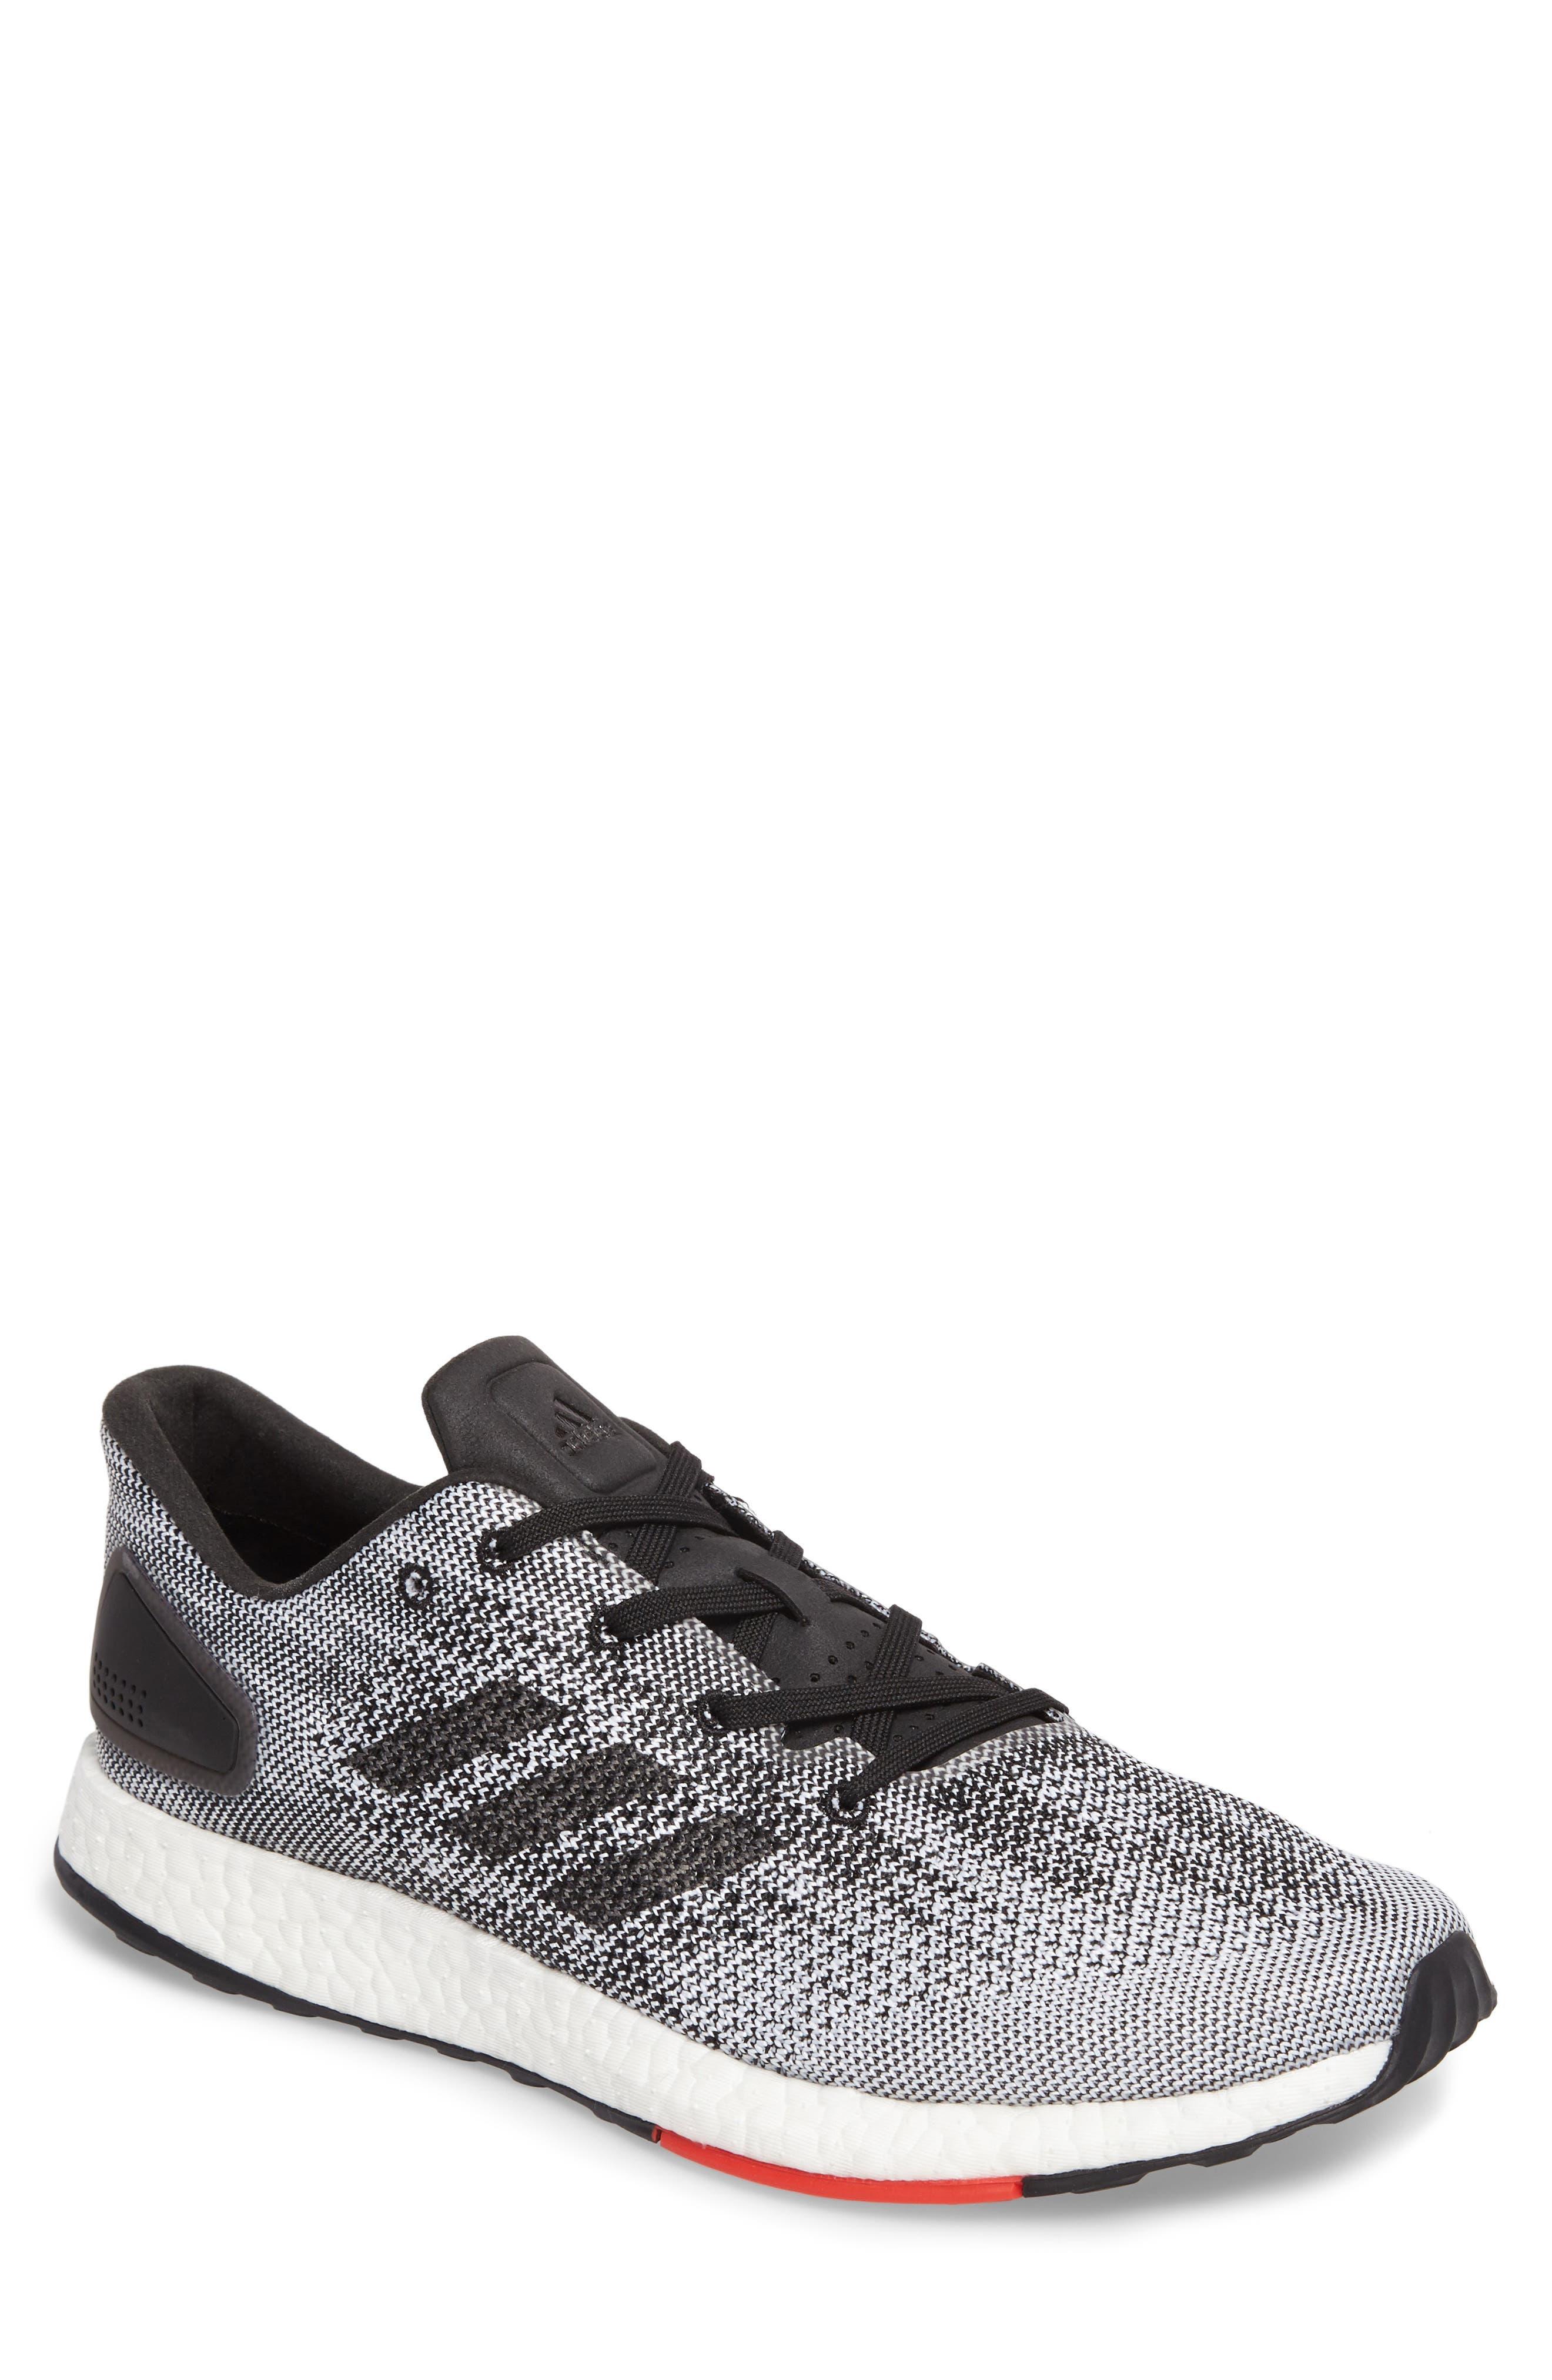 PureBoost DPR Running Shoe,                         Main,                         color, Core Black/White